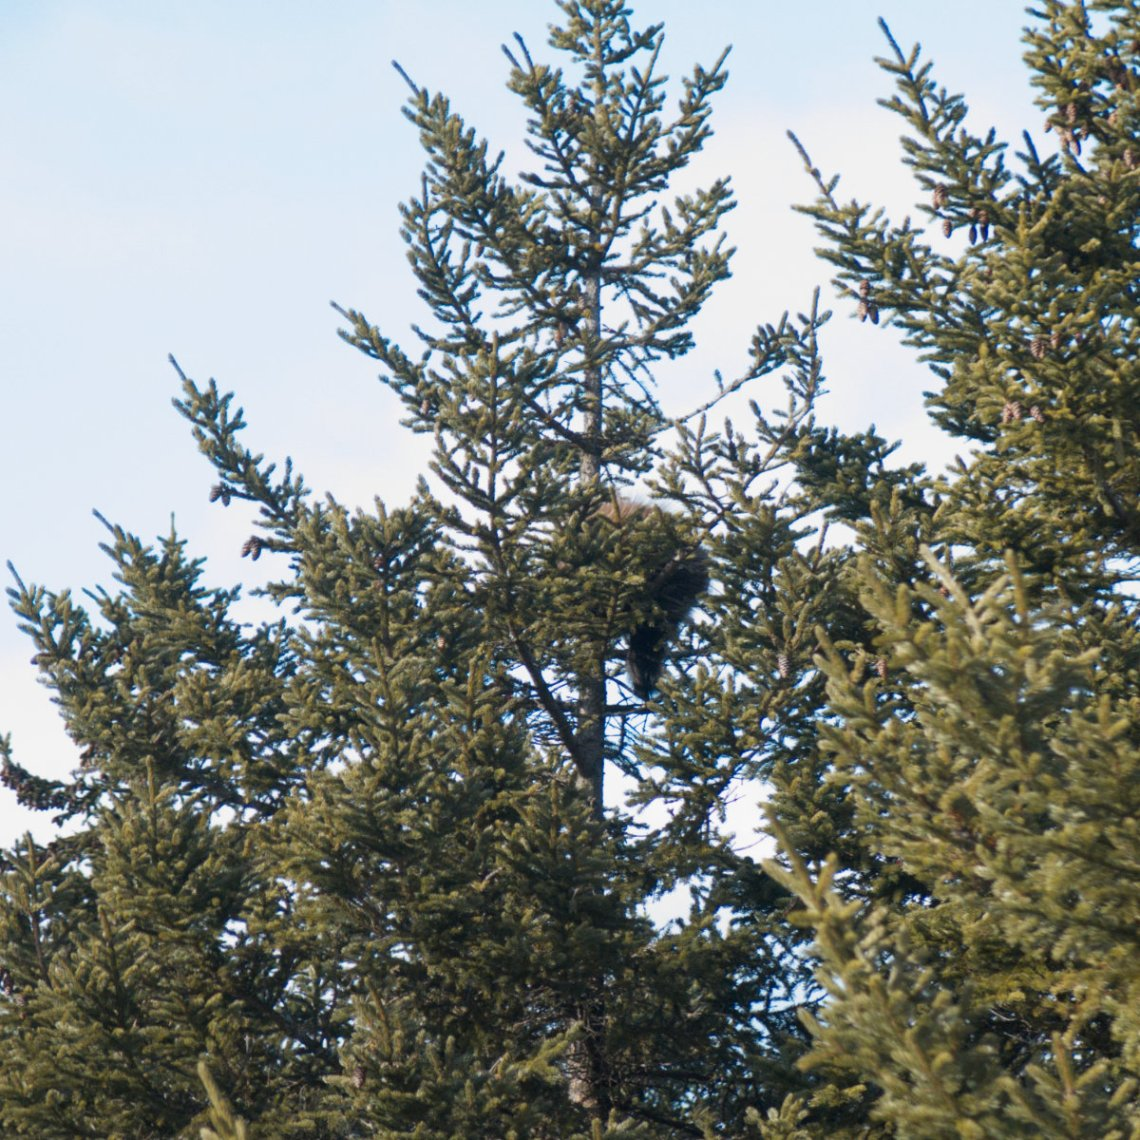 Belknap-20181206-Porcupine-Tree